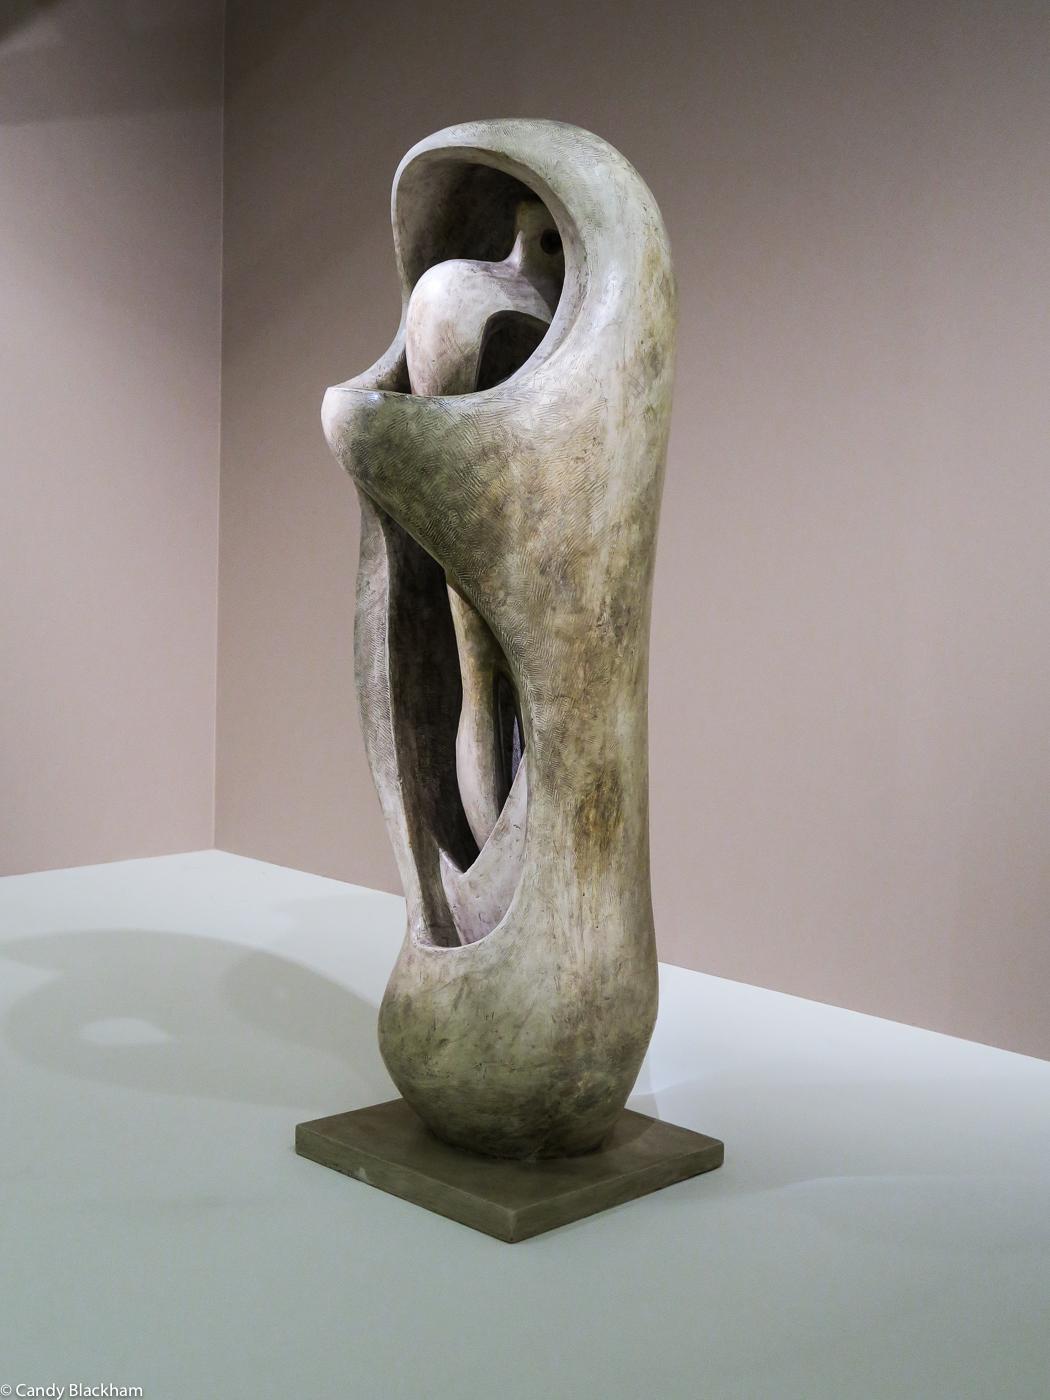 Henry Moore: Internal/external form (1952-53)